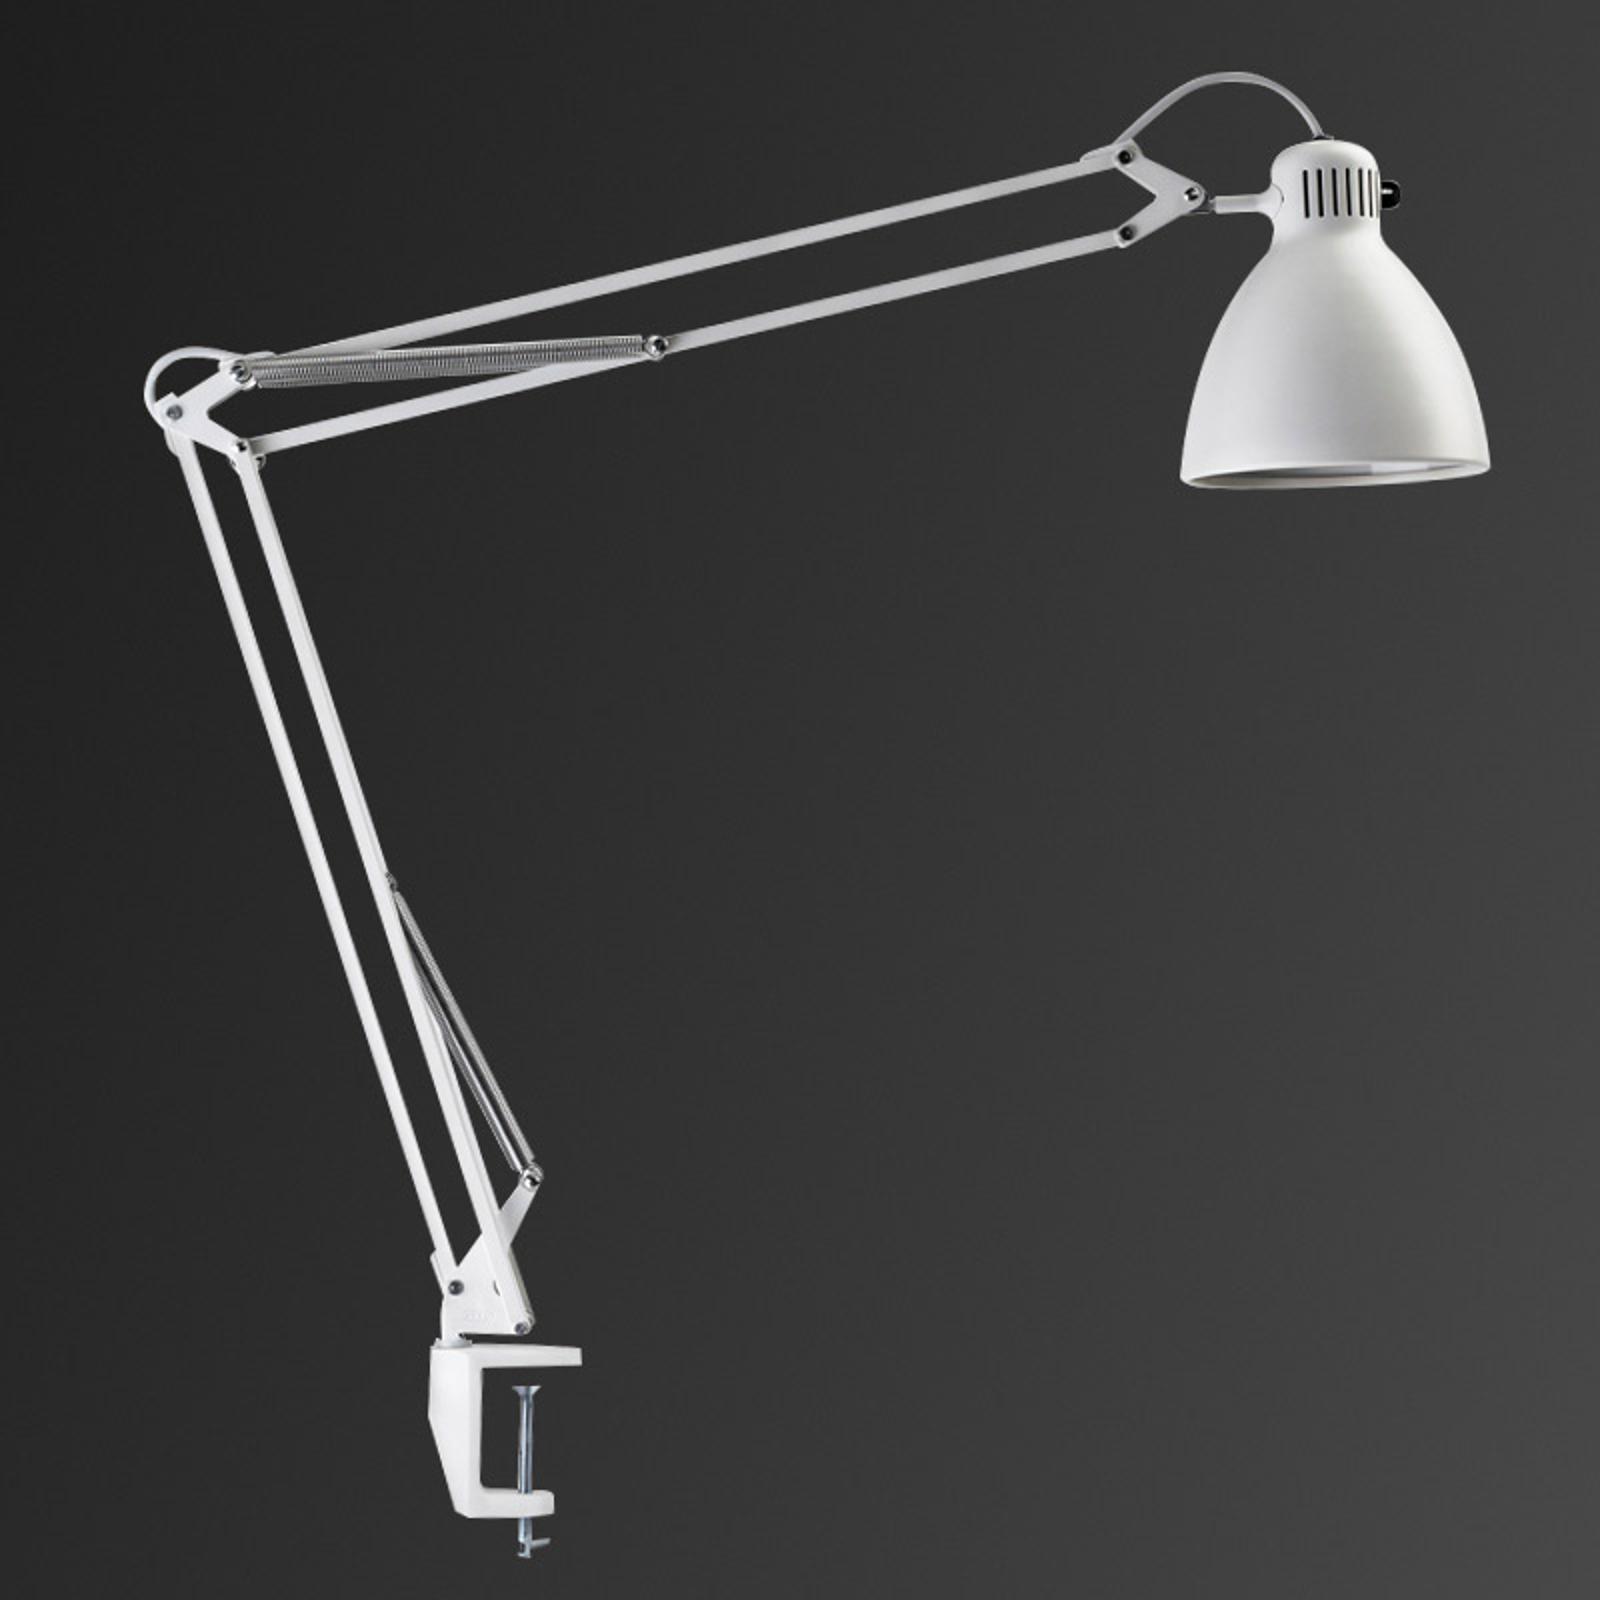 Lampe de bureau innovante L-1 LED blanc